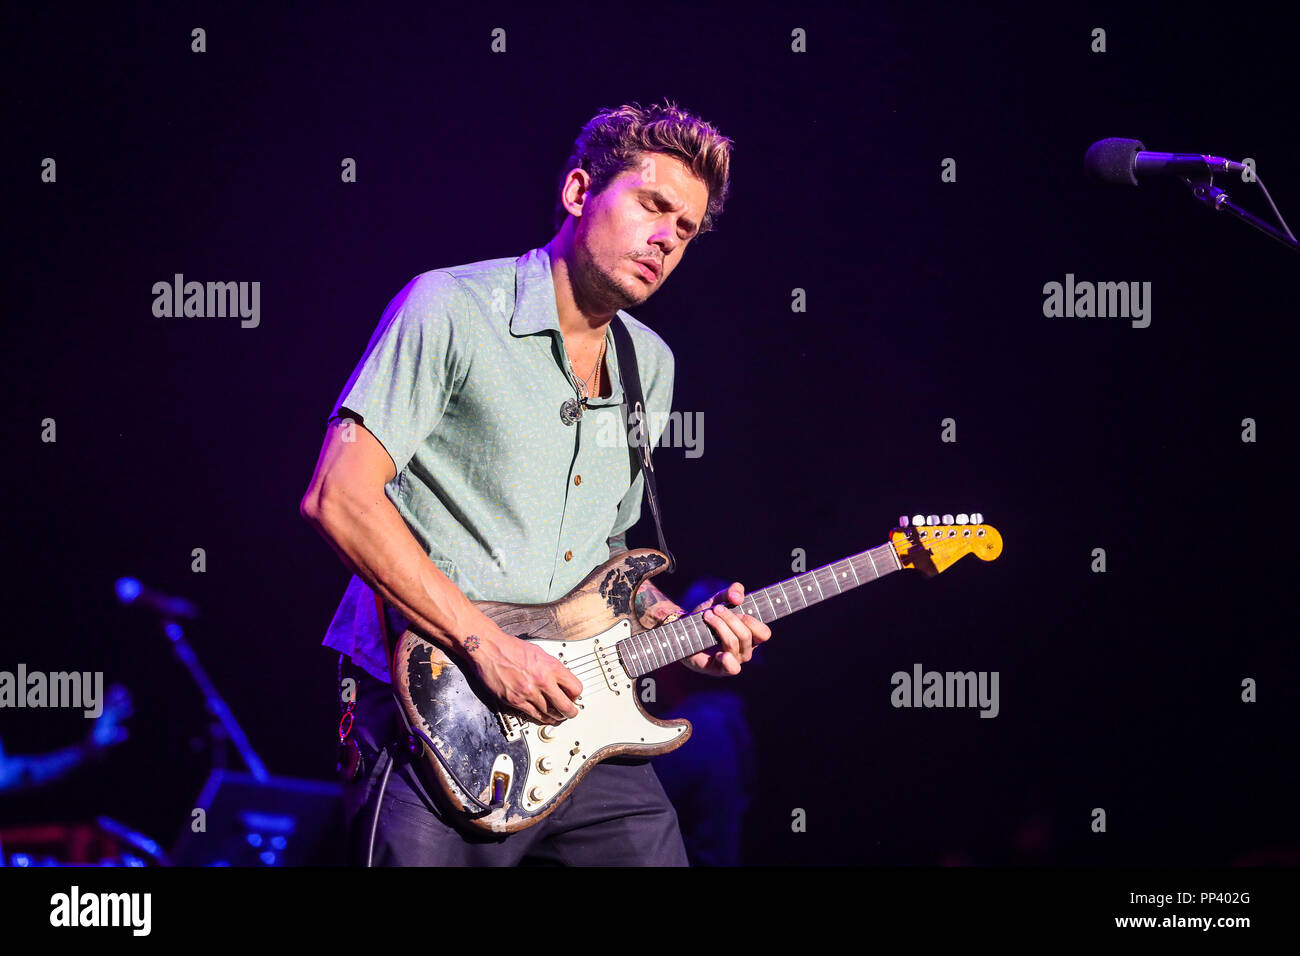 Music Artist JOHN MAYER performs in North Carolina as part